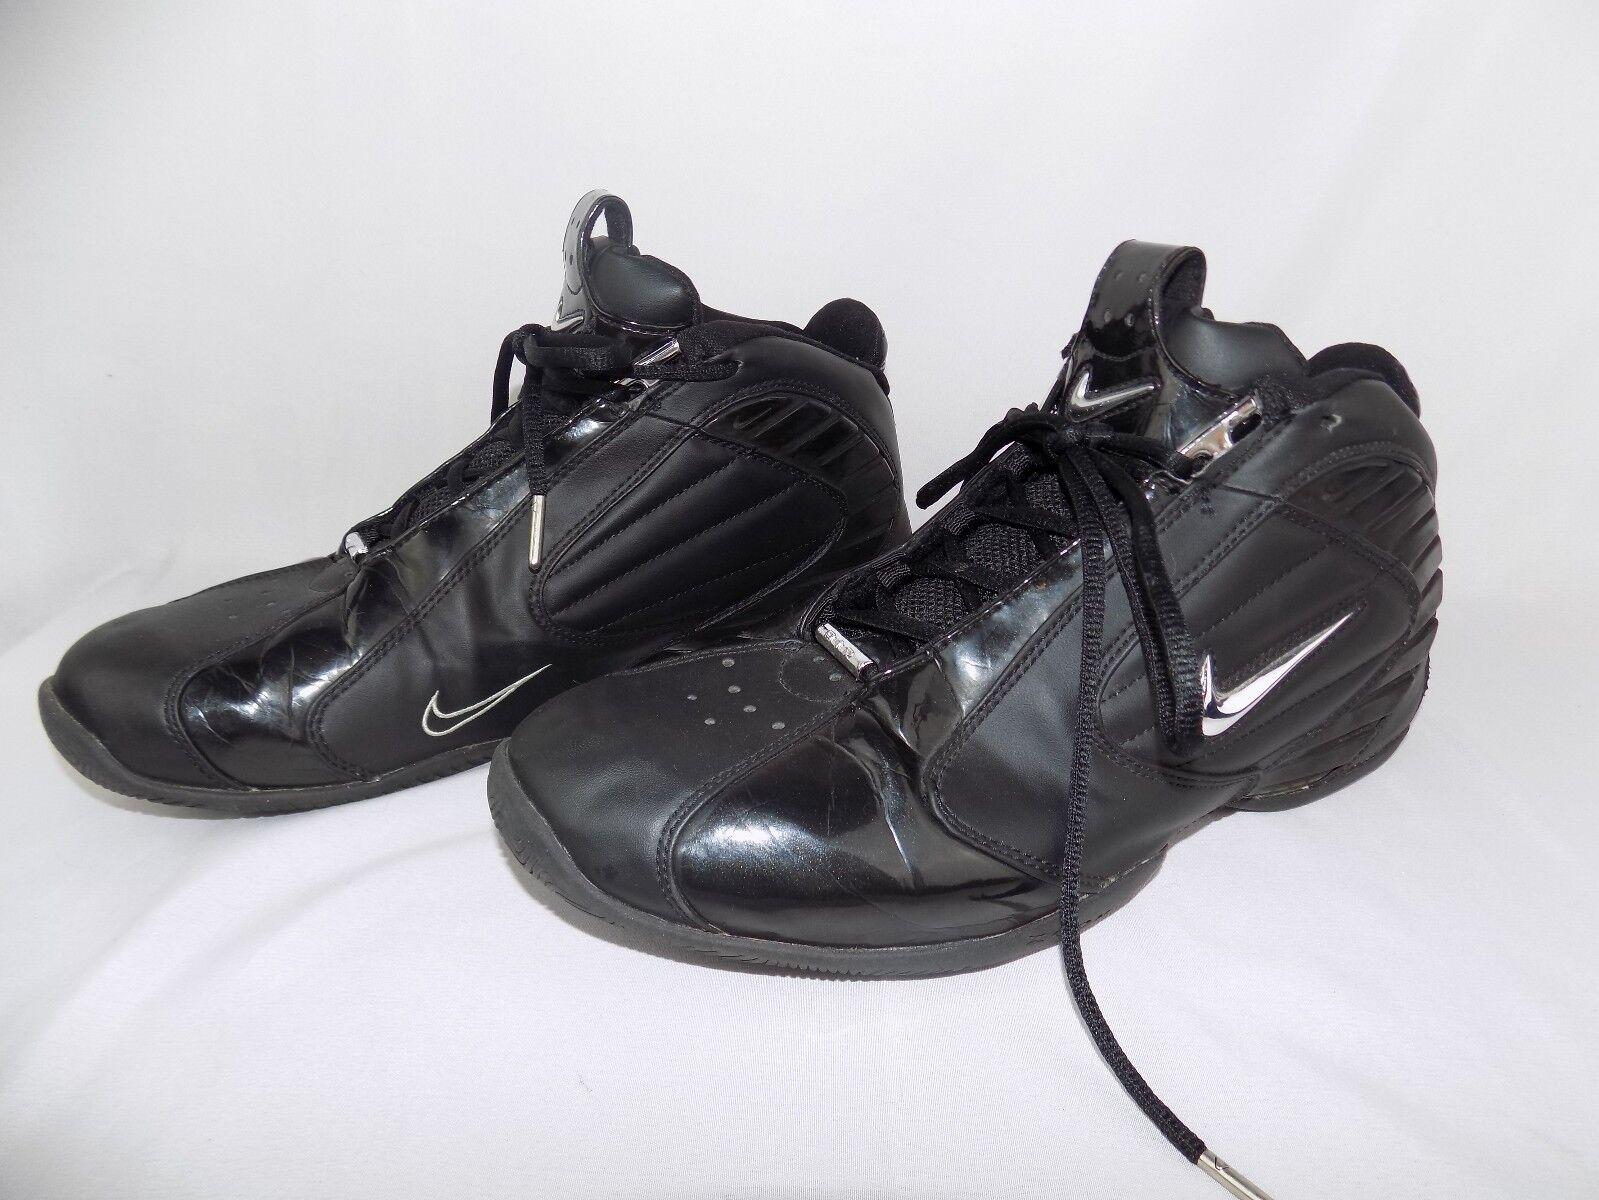 a0273d0d53e 2018 Calzado Calzado Calzado Atlético Nike Zoom Air Negro Con Plateado para  Hombre 41667c